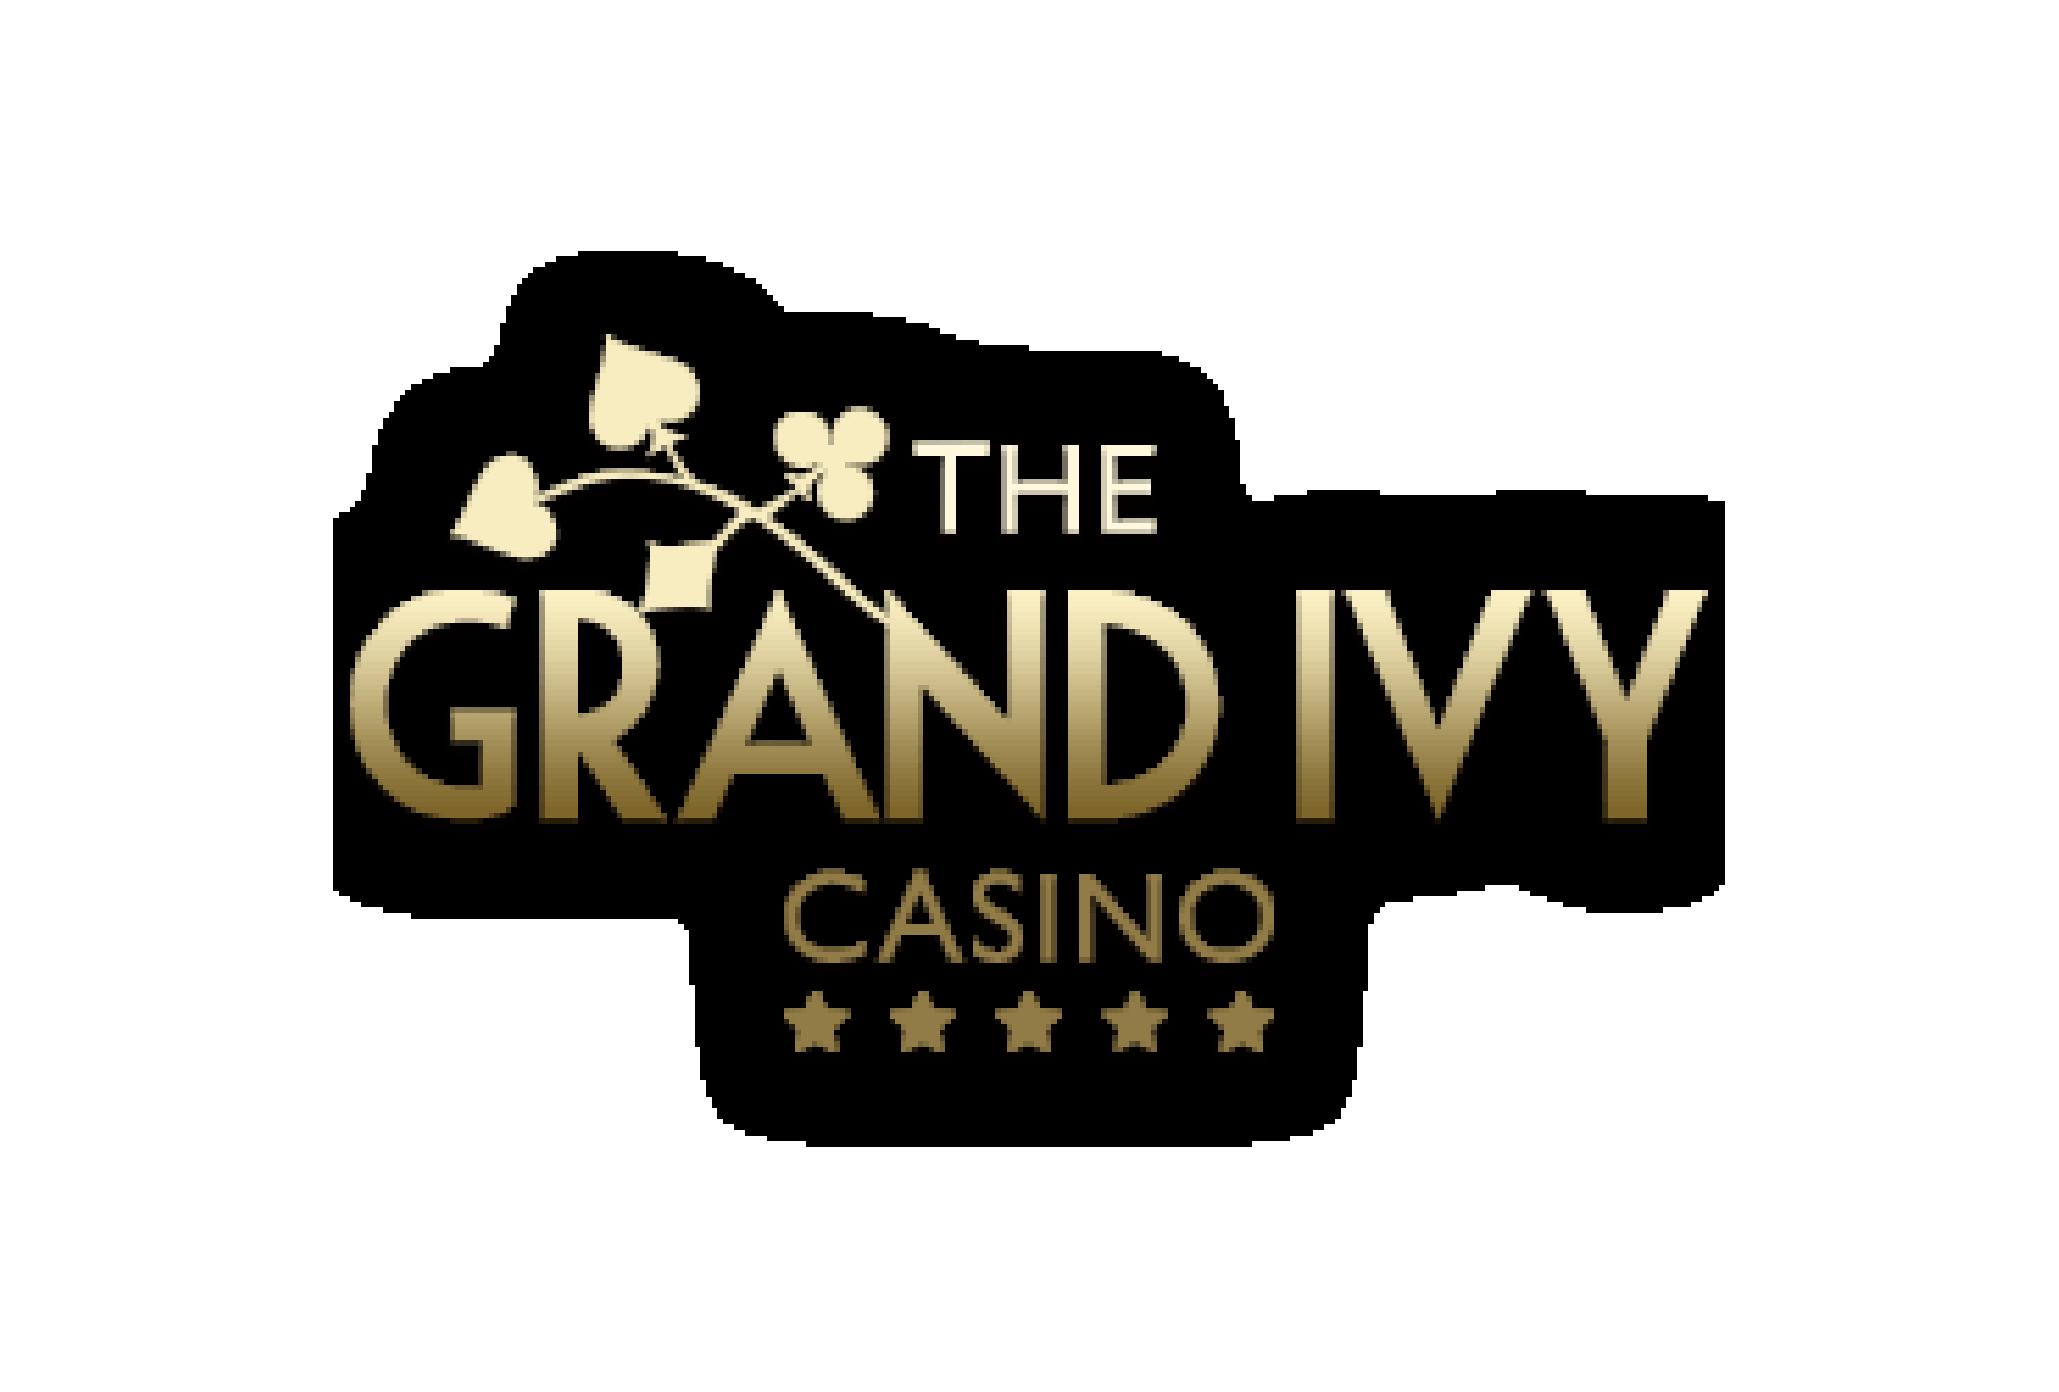 Grandy-Ivy-casino-logo-01